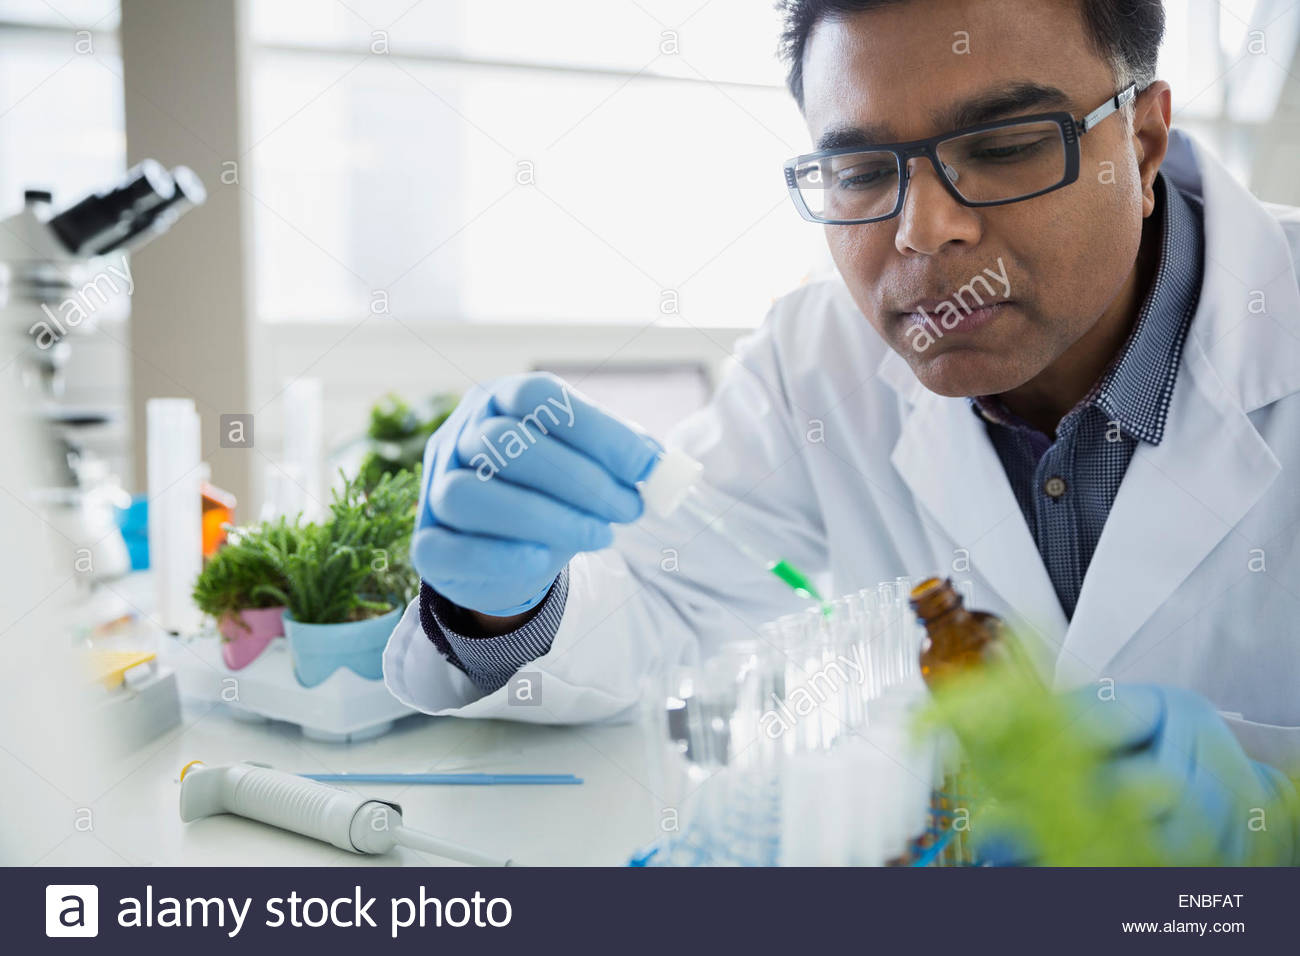 Scientist adding liquid to test tubes in laboratory - Stock Image